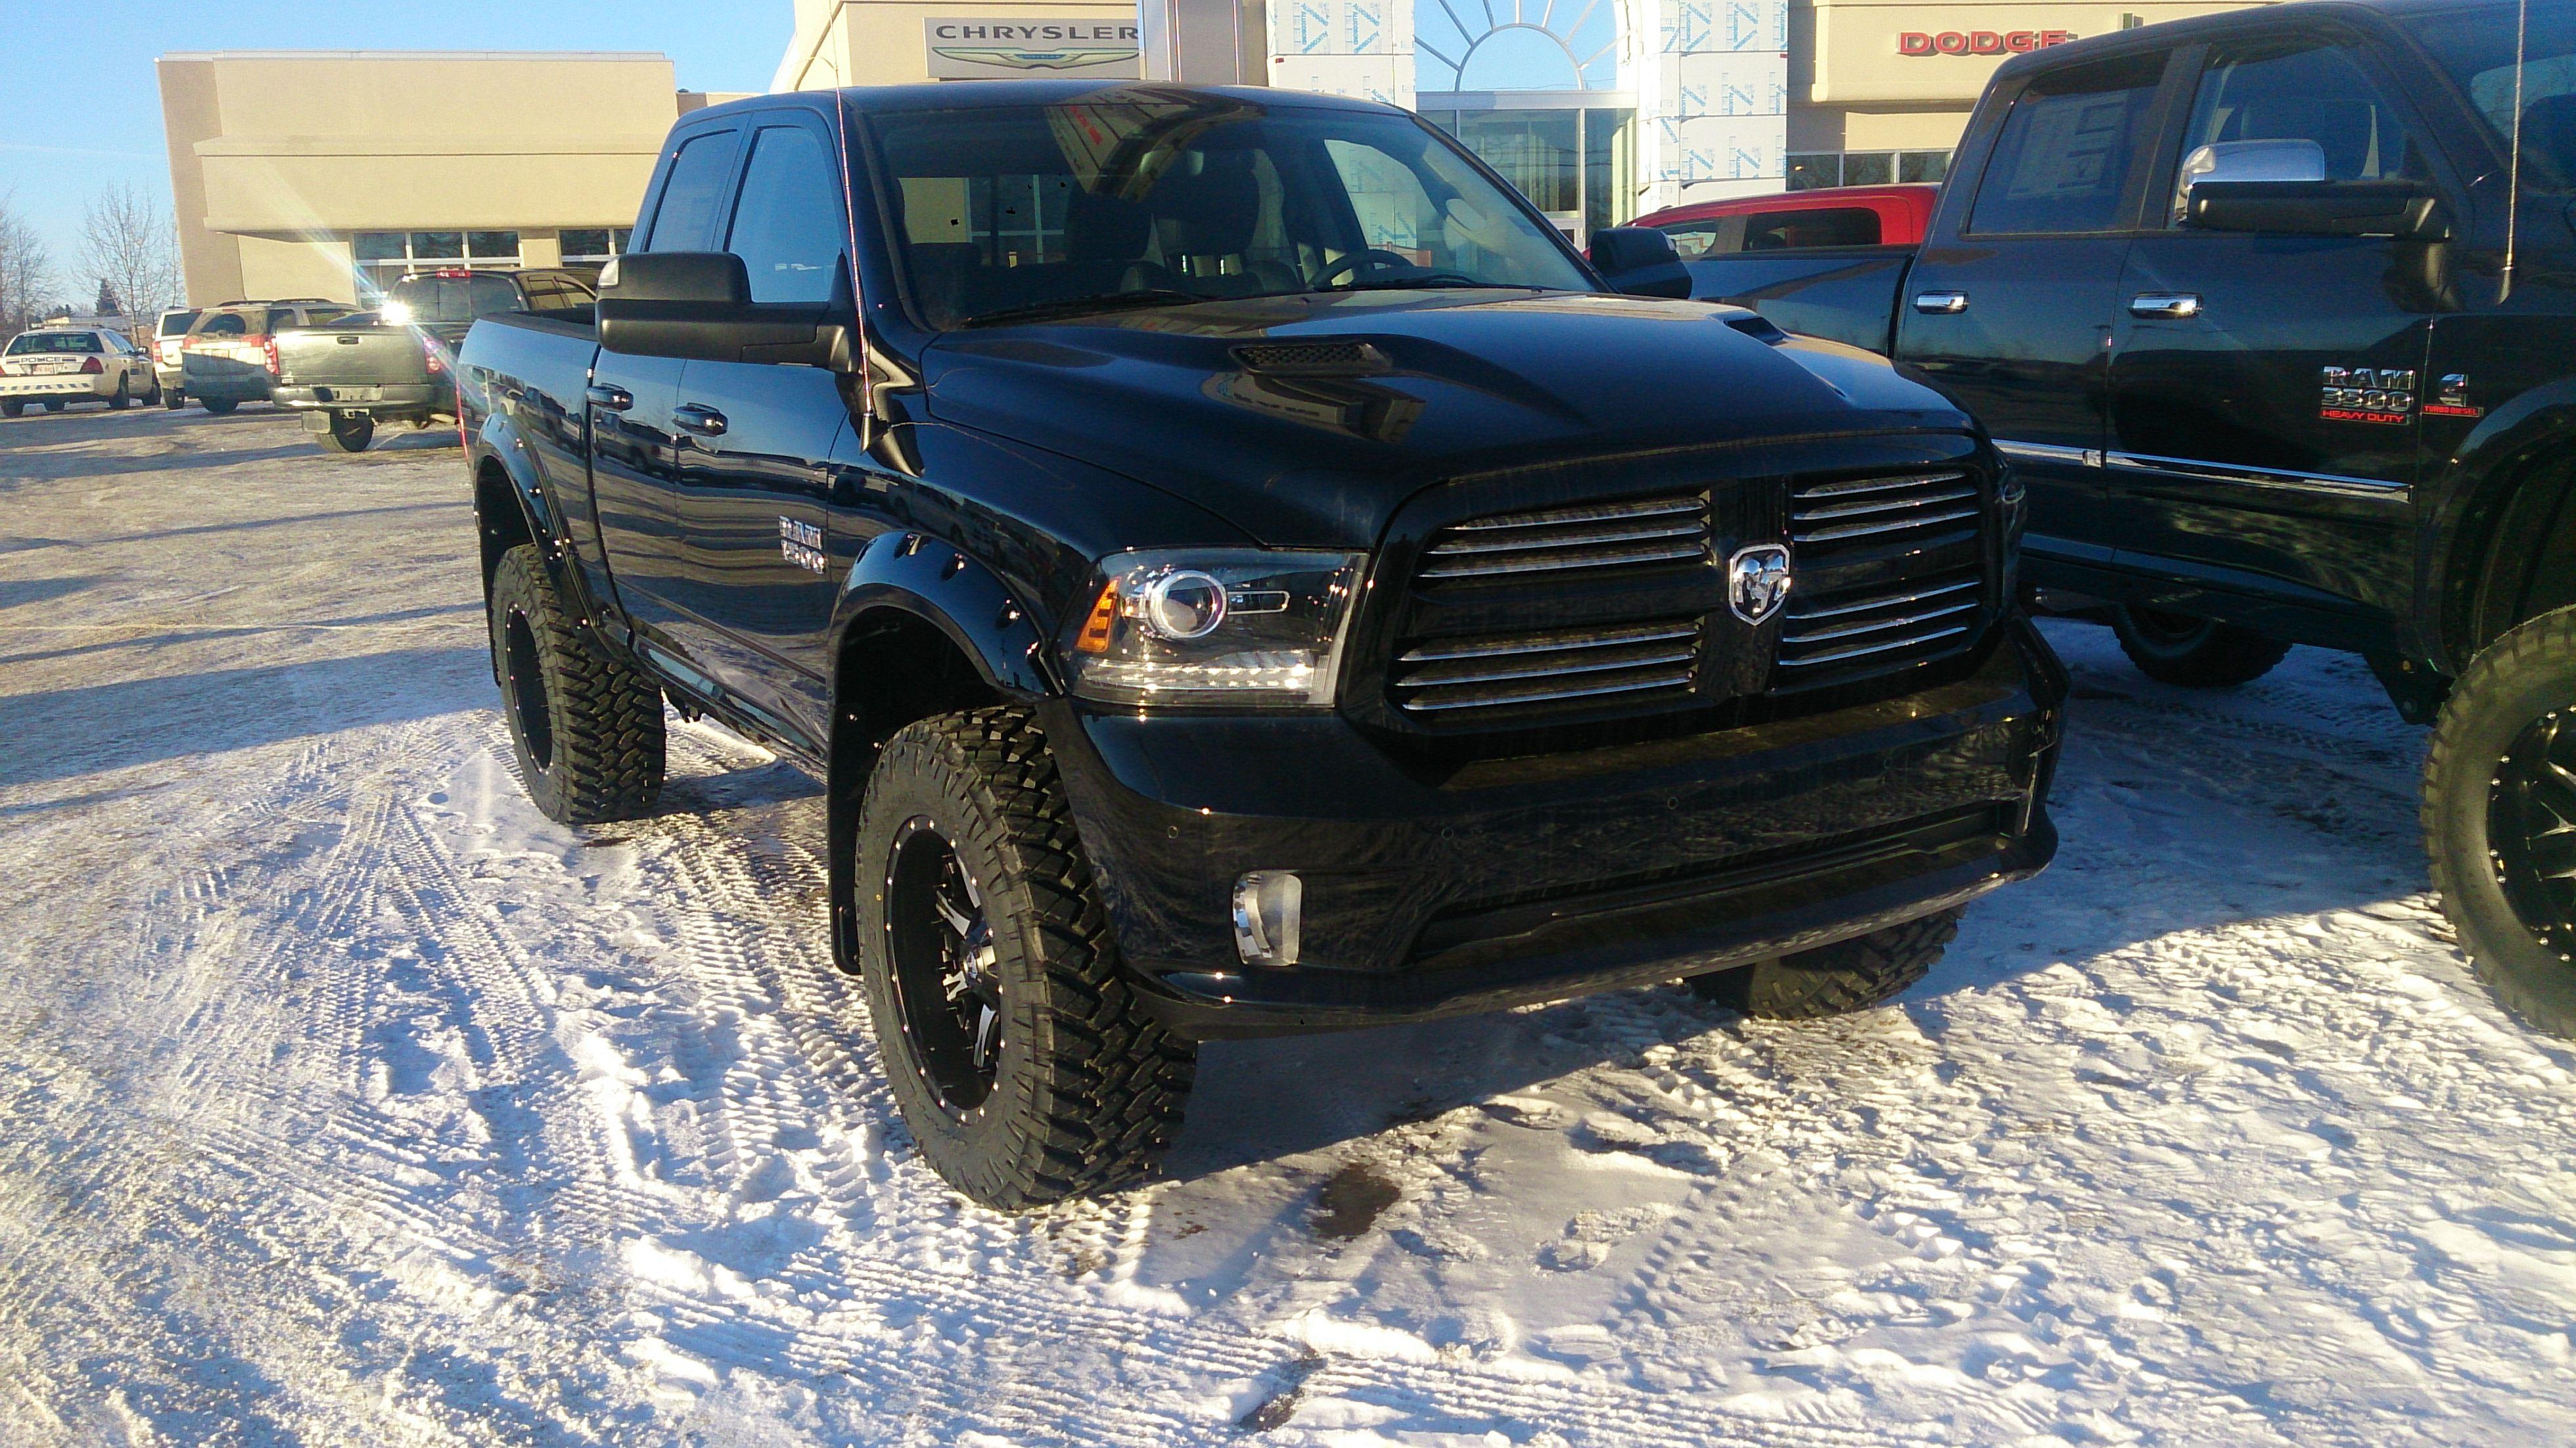 Pin By Levi Johnson On Mopar Dodge Trucks Lifted Dodge Dodge Ram Lifted